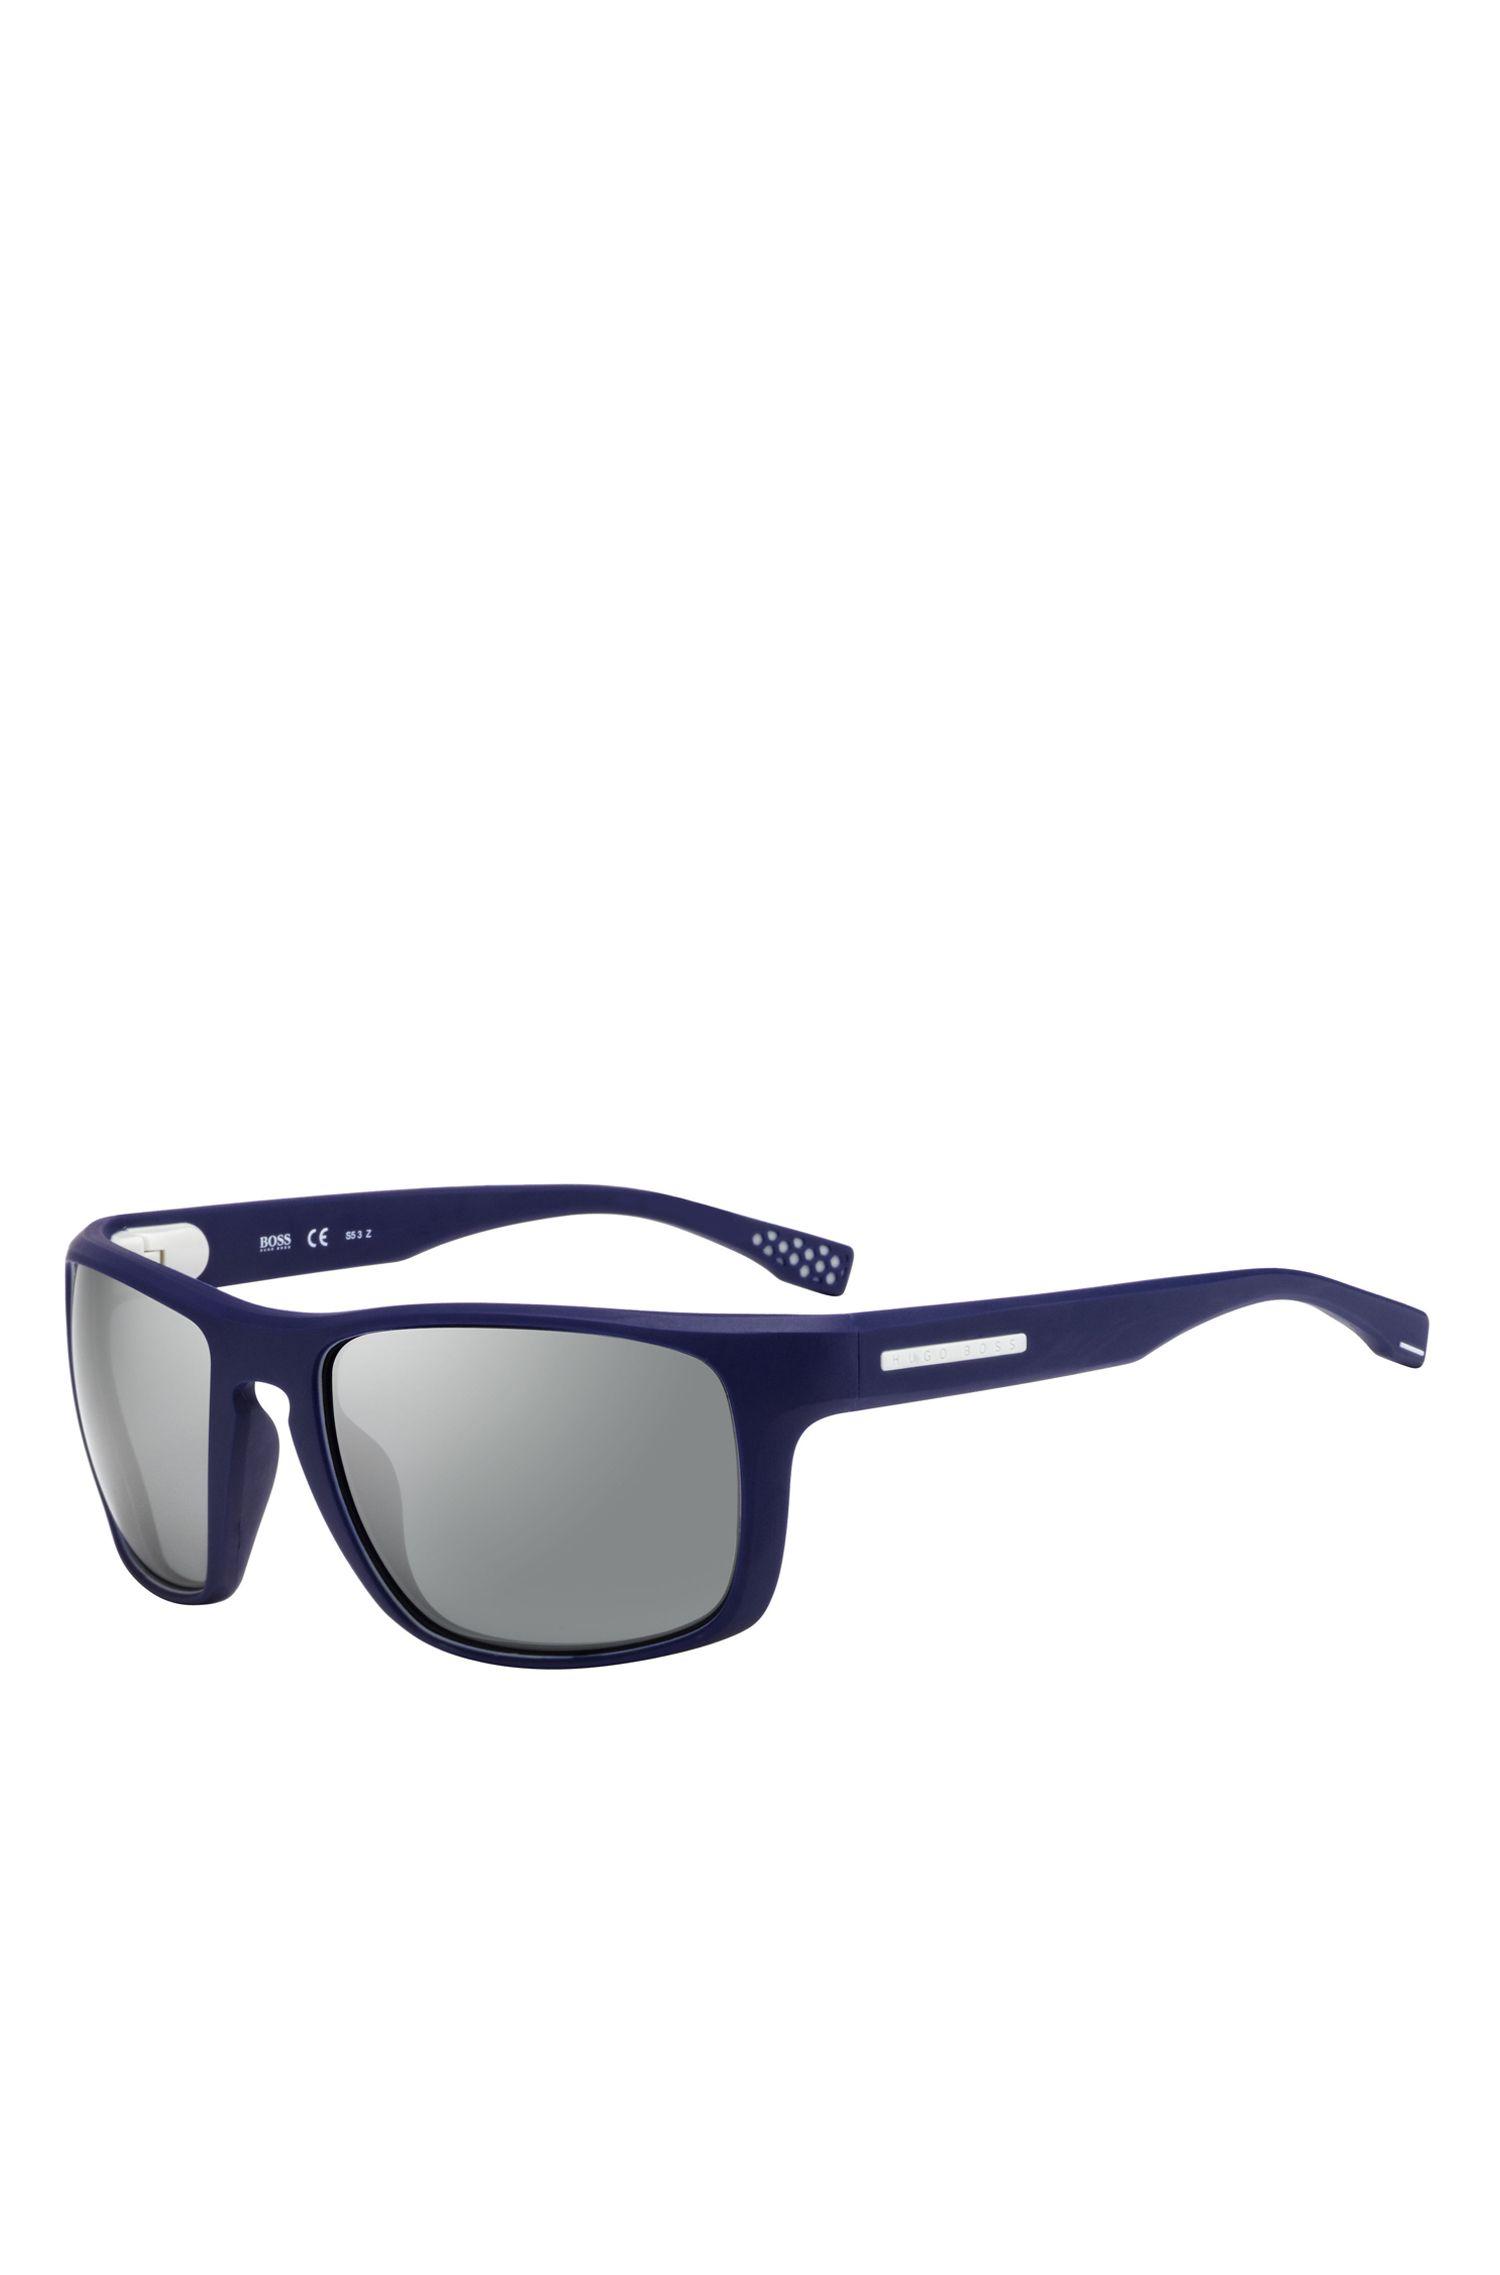 'BOSS 0800S' | Mirror Lens Water Repellent Rectangular Sunglasses